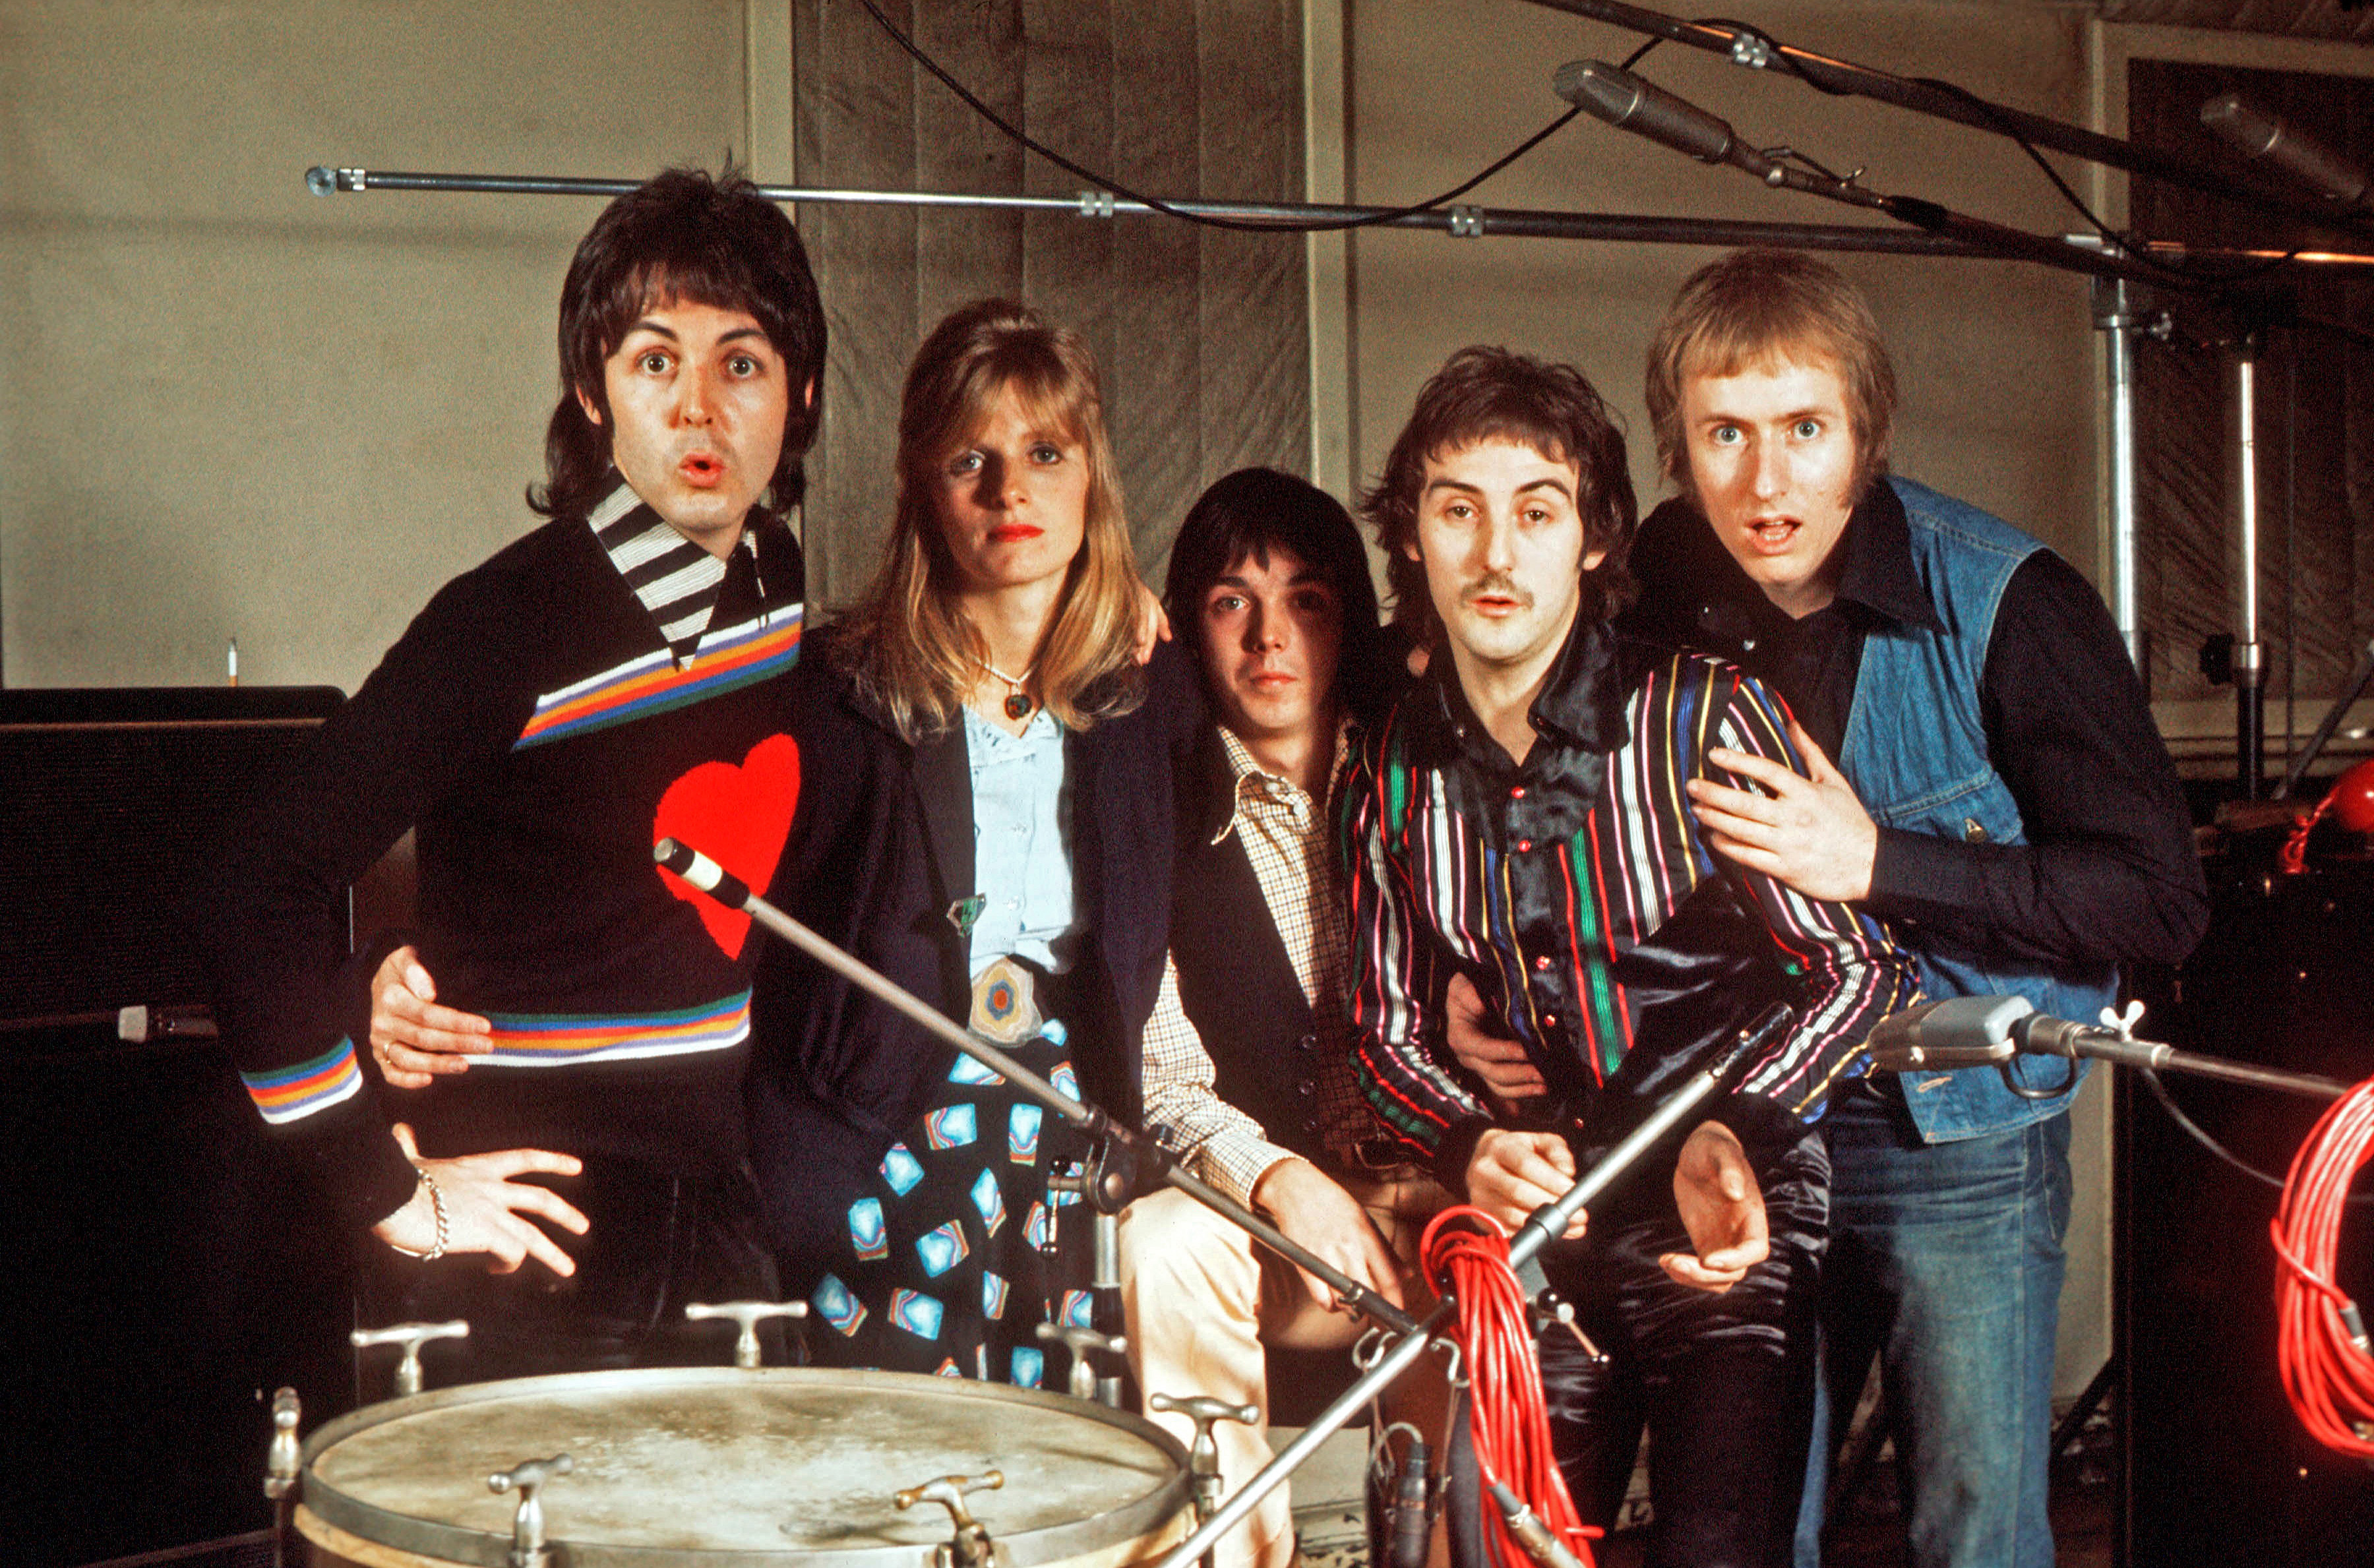 Wings Paul McCartney Linda Jimmy McCulloch Denny Laine Geoff Britton